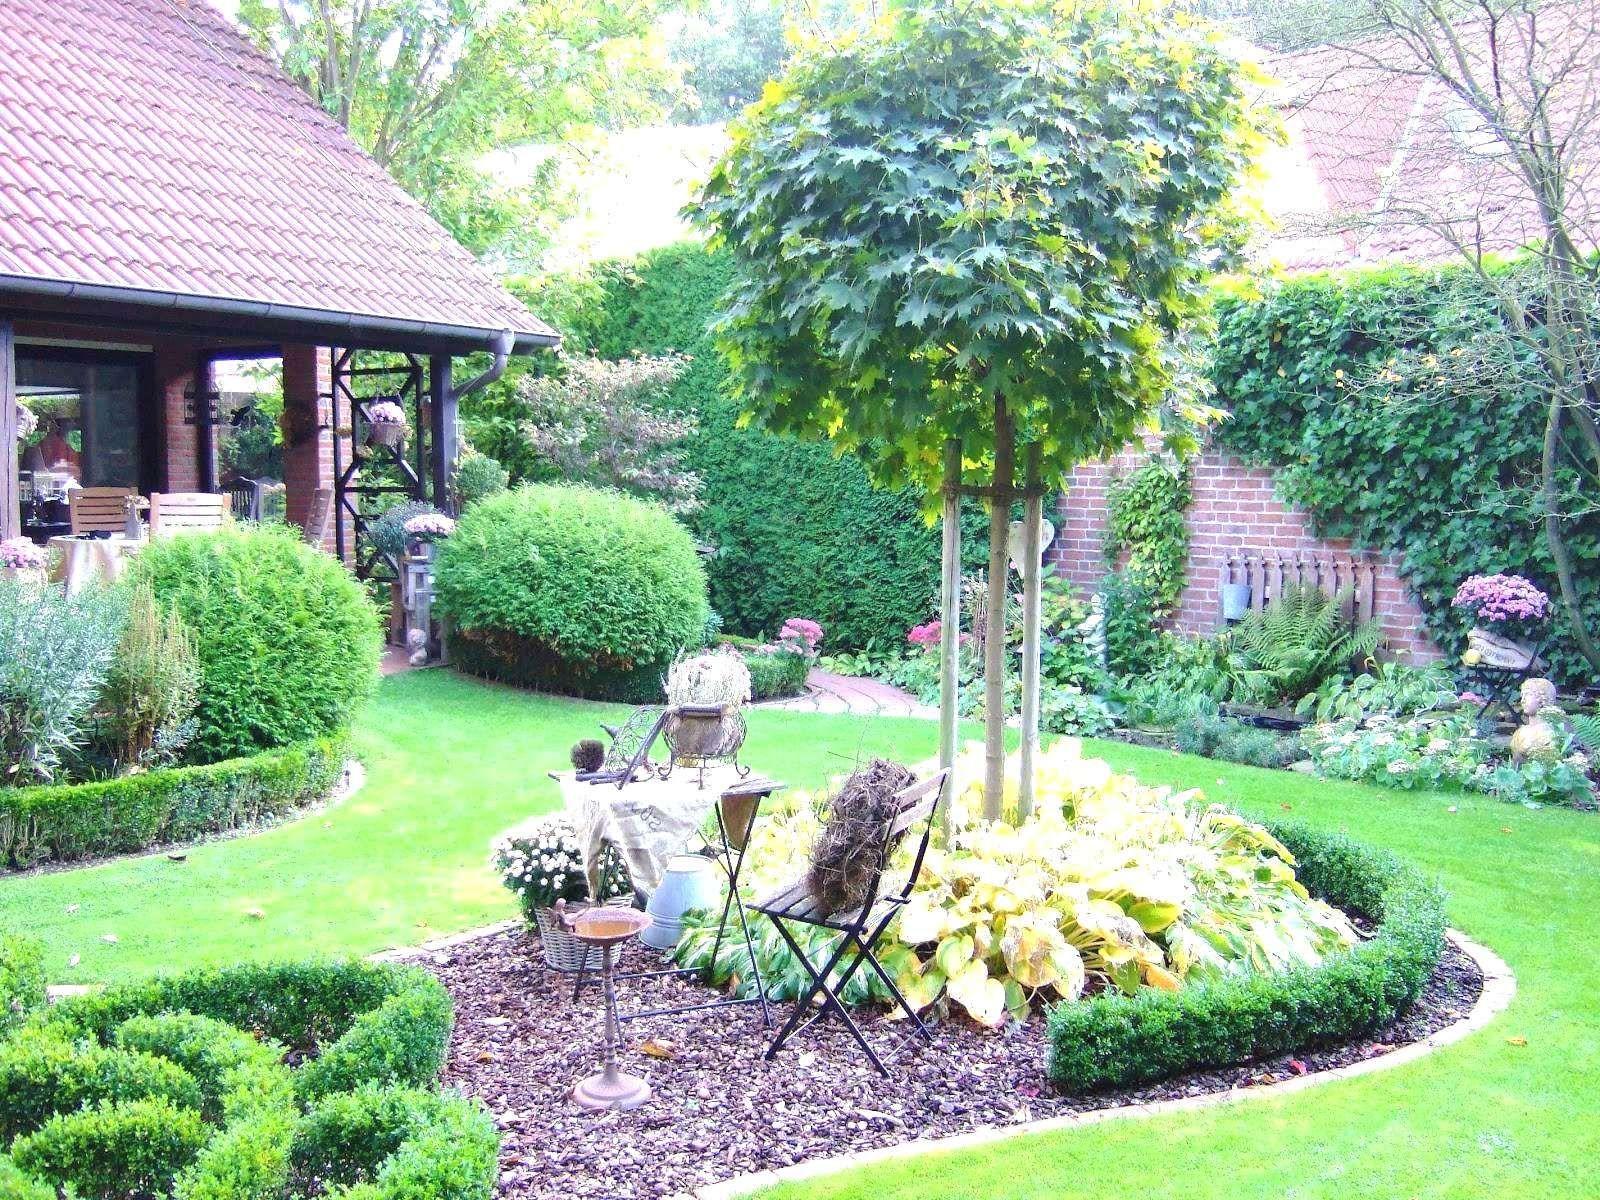 Garten Gestalten Sichtschutz Frisch Garten Ideas Garten Anlegen Inspirational Aussenleuchten